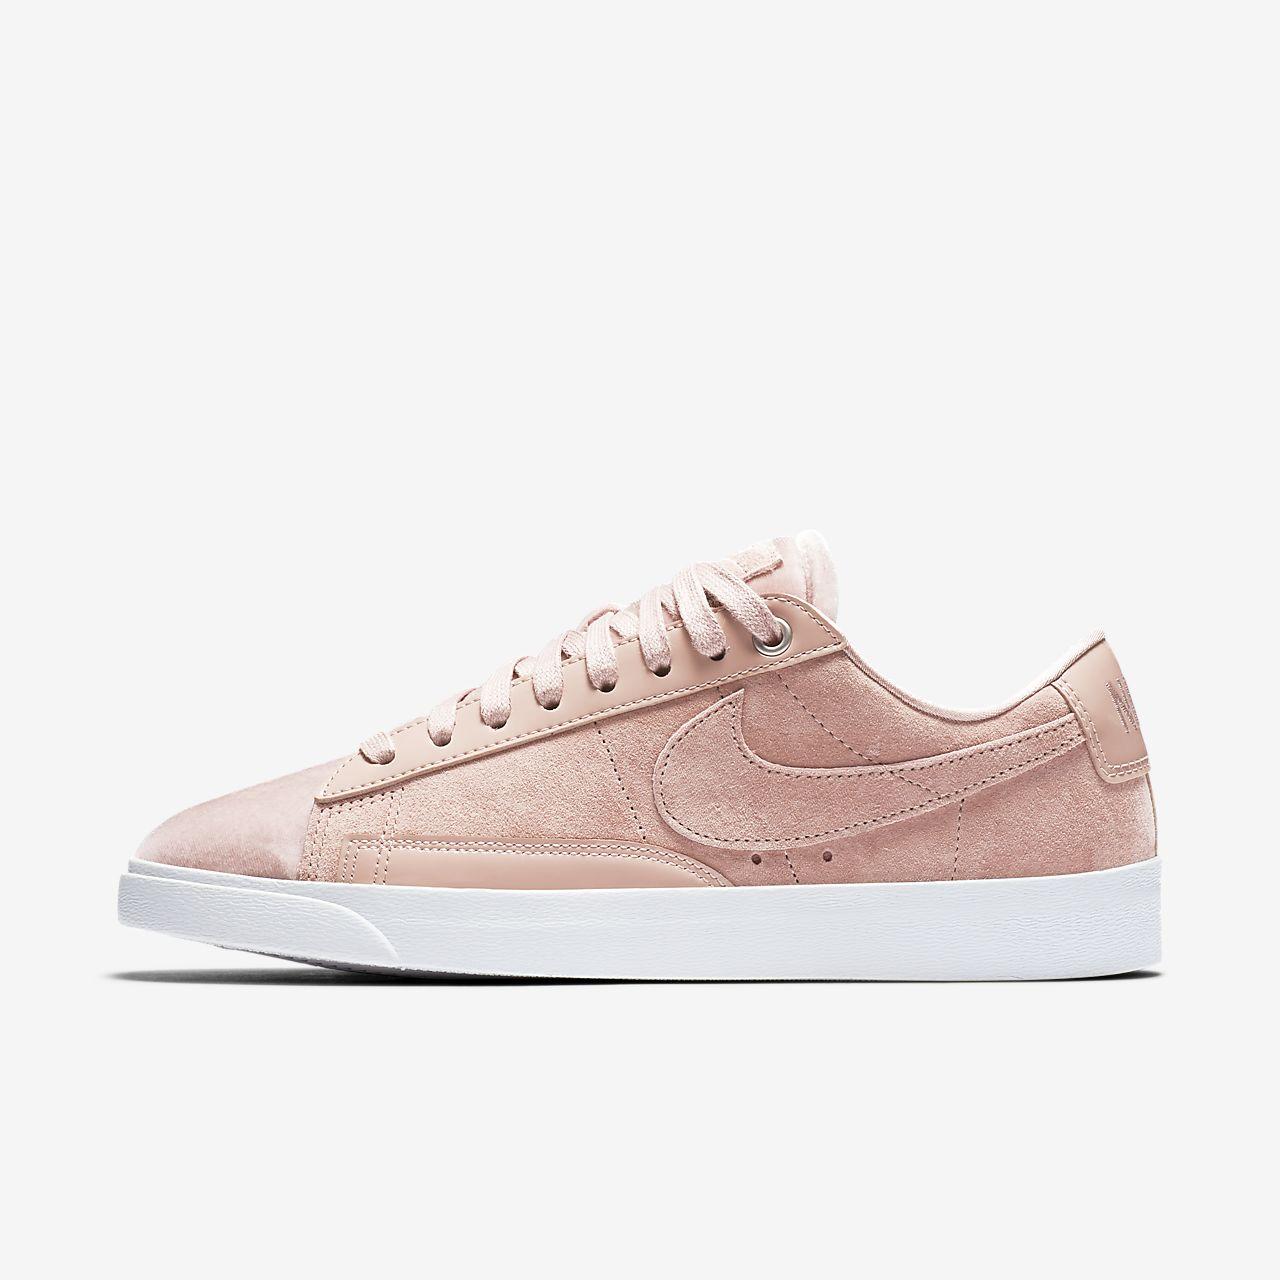 Nike Blazer Baja Damen Rosa baratos extremadamente zZccRT8x